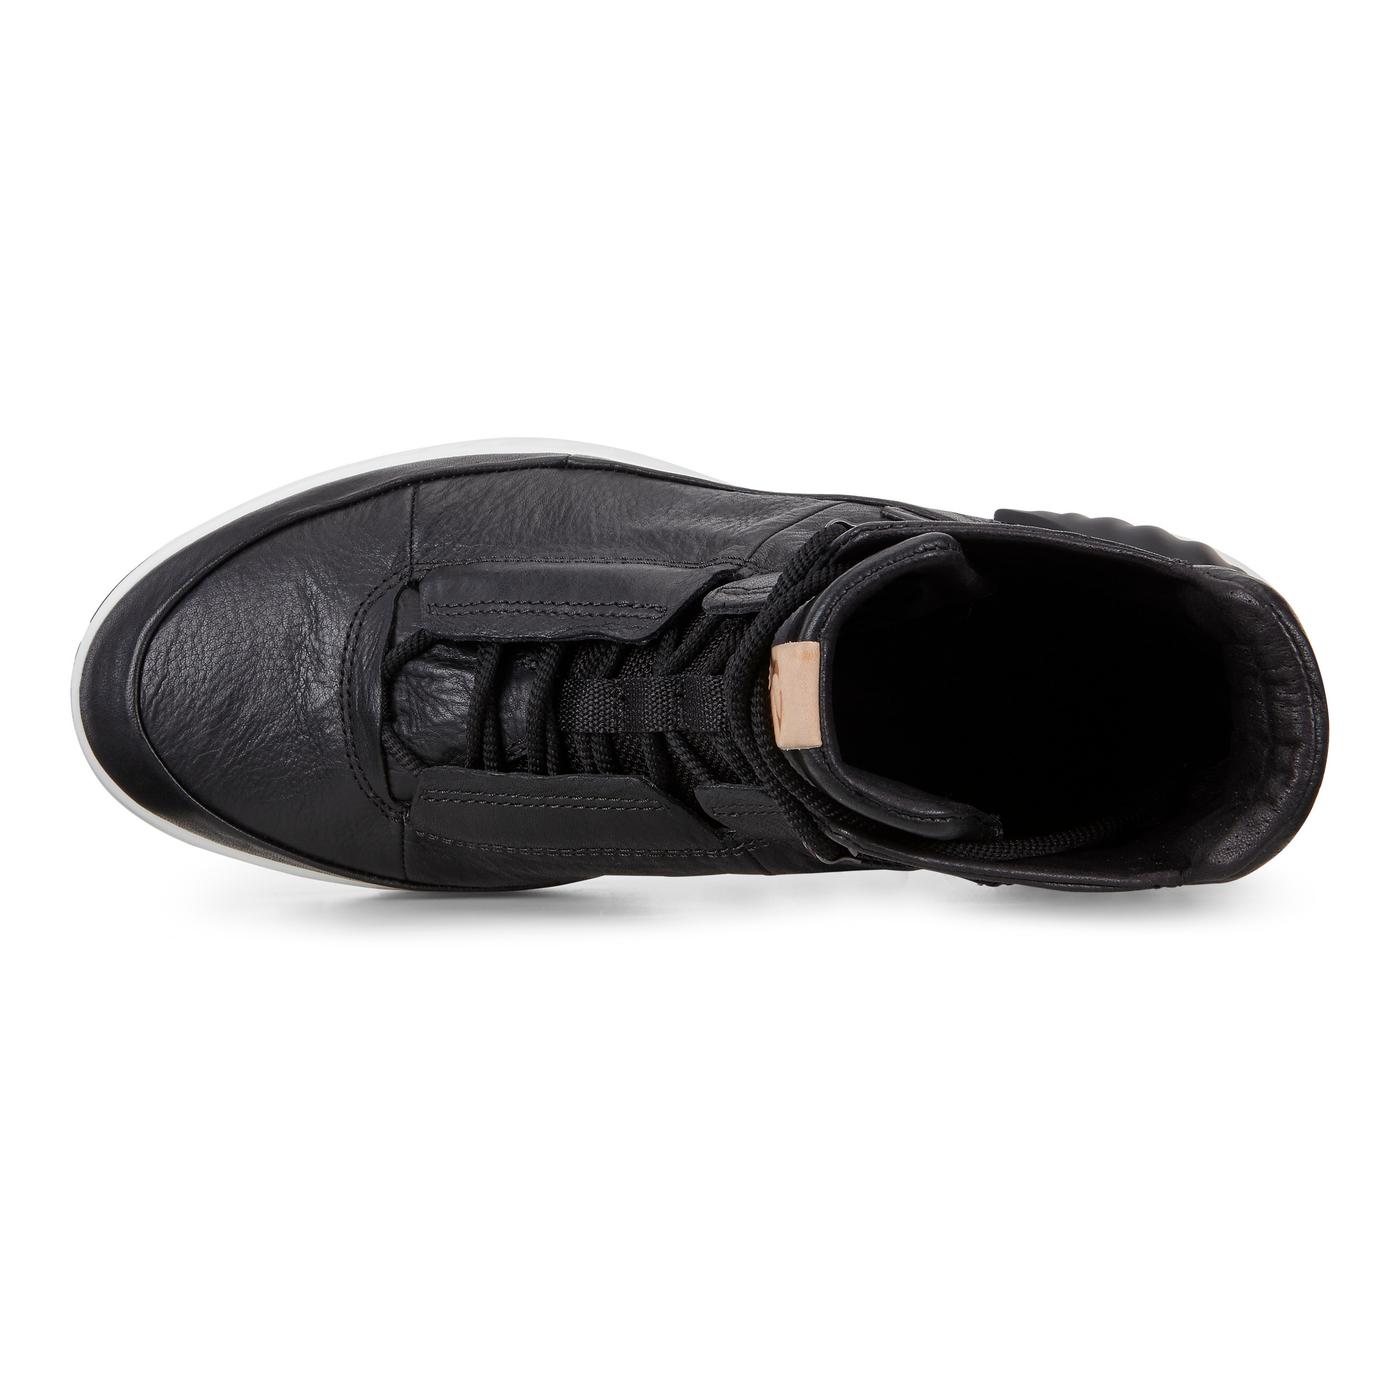 ECCO EXOSTRIKE Outdoor Ankle